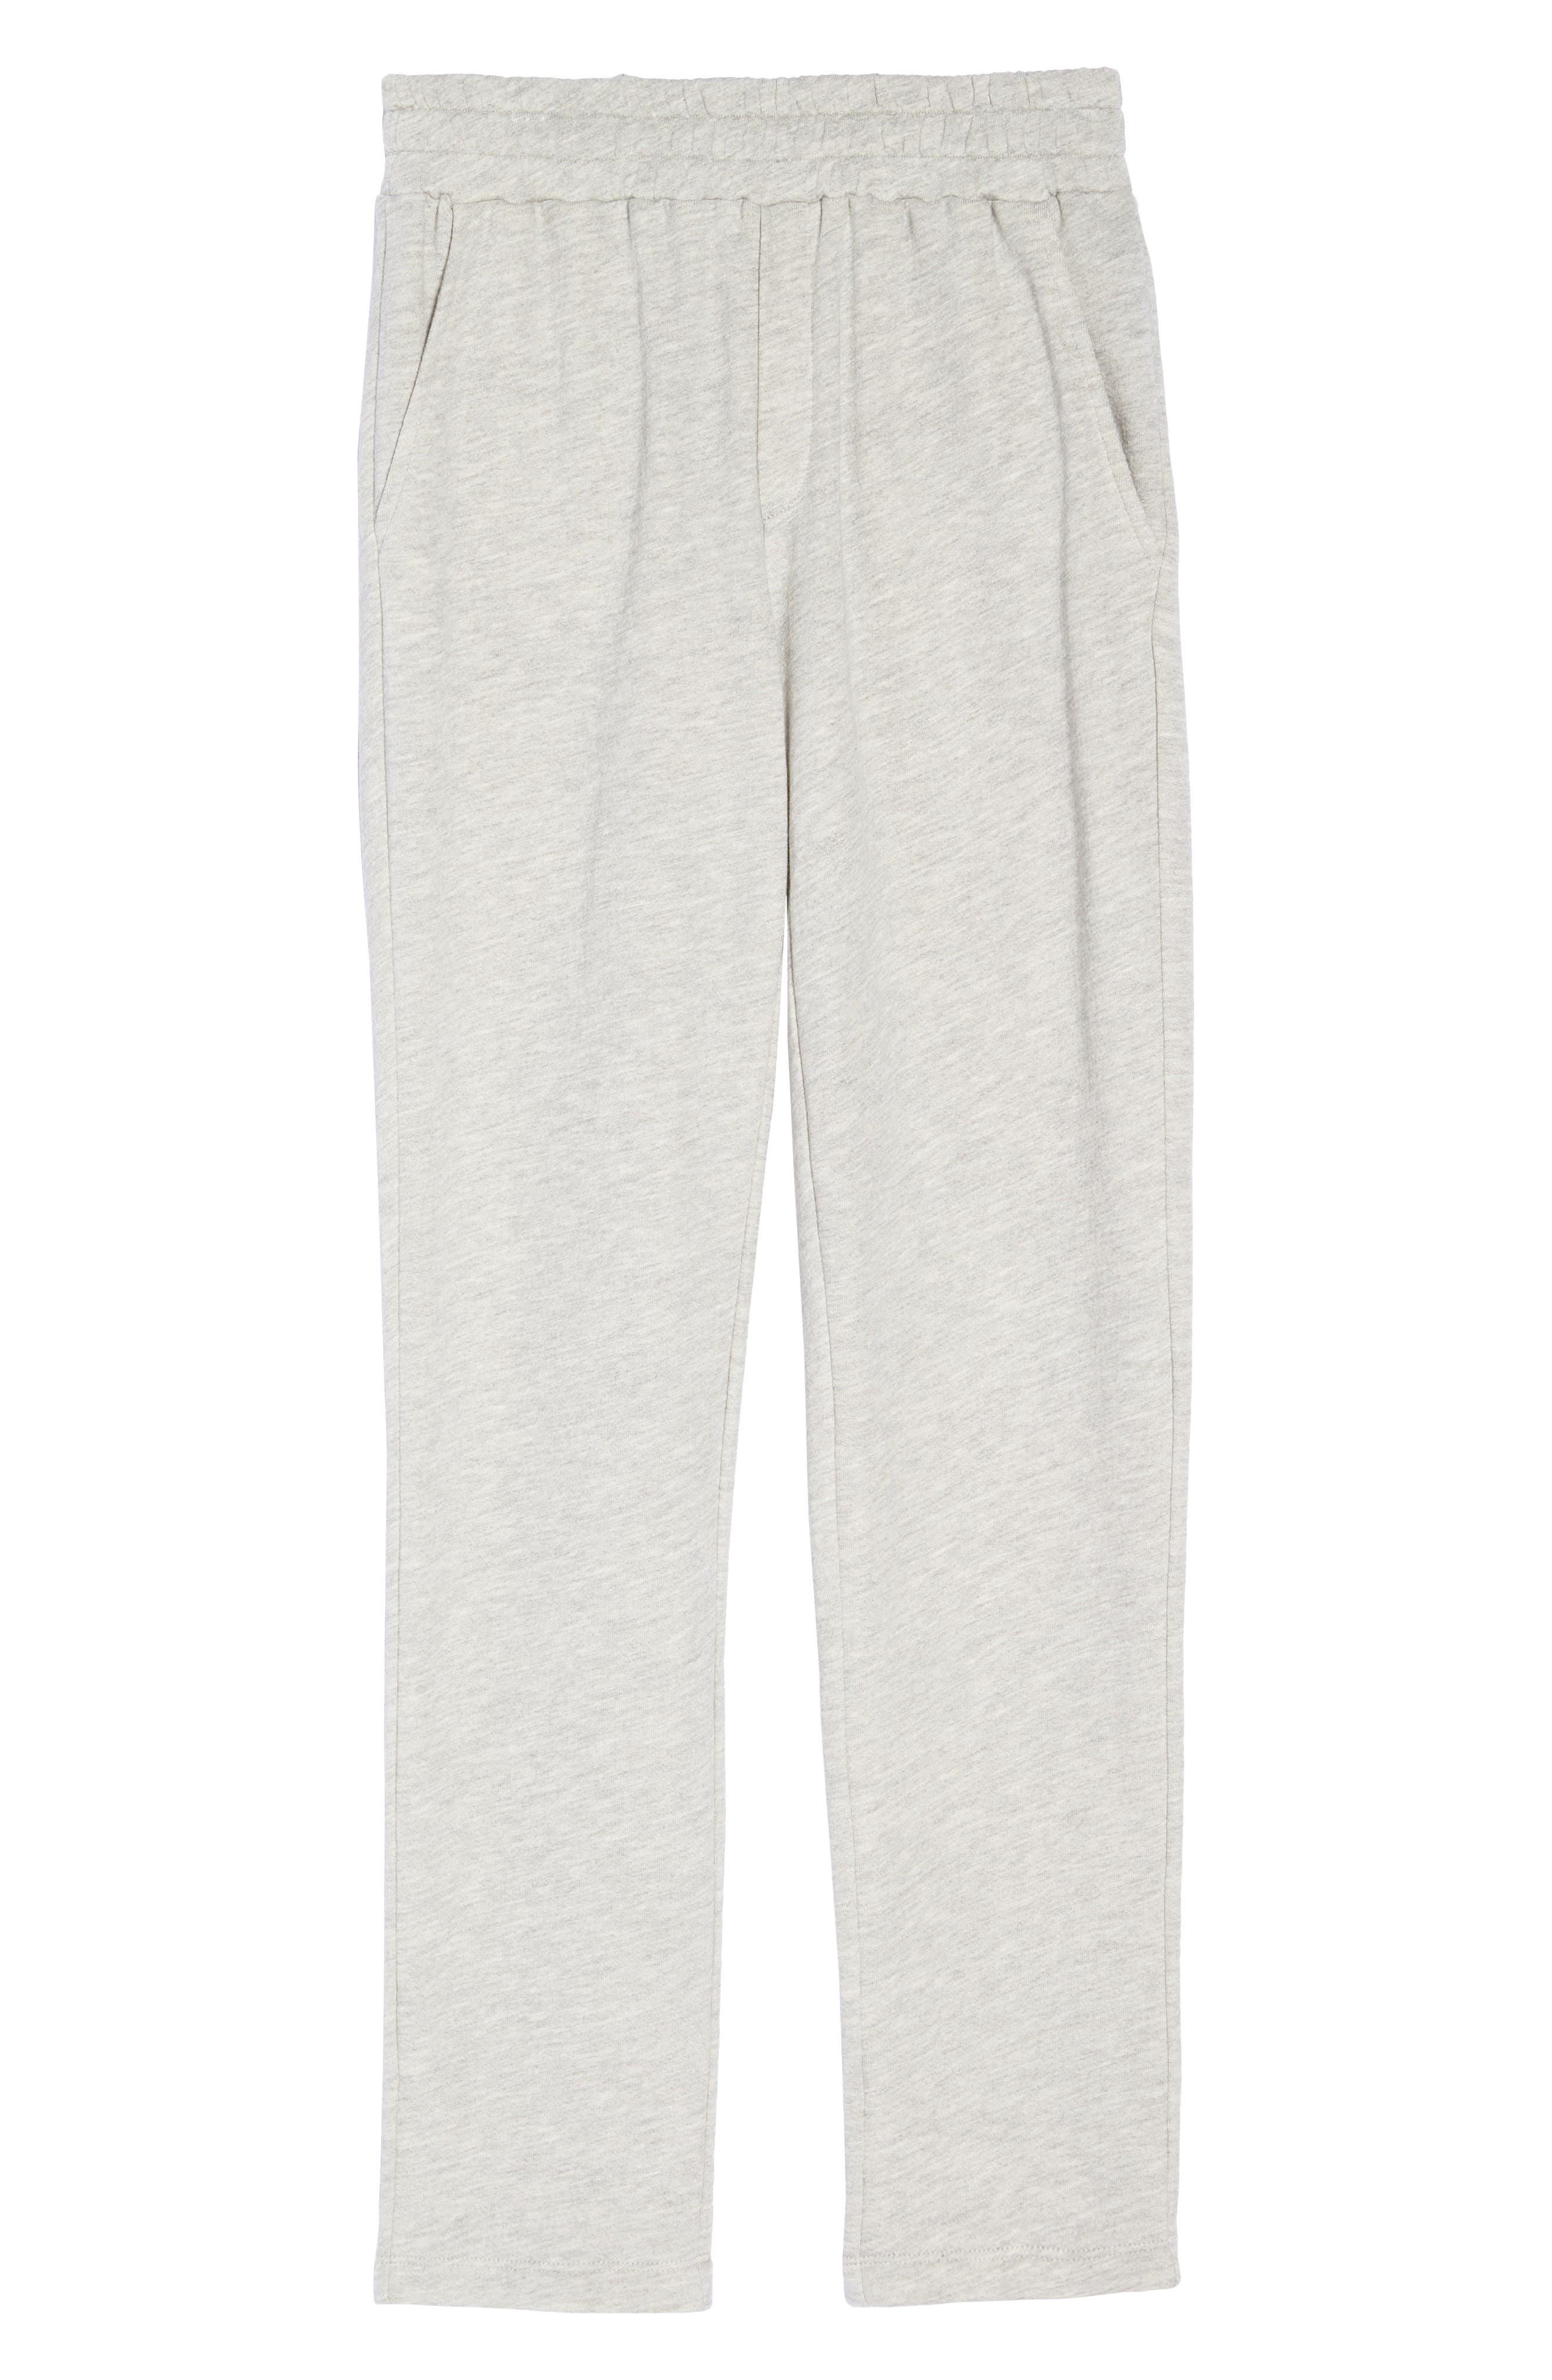 Terry Pajama Pants,                             Alternate thumbnail 6, color,                             028